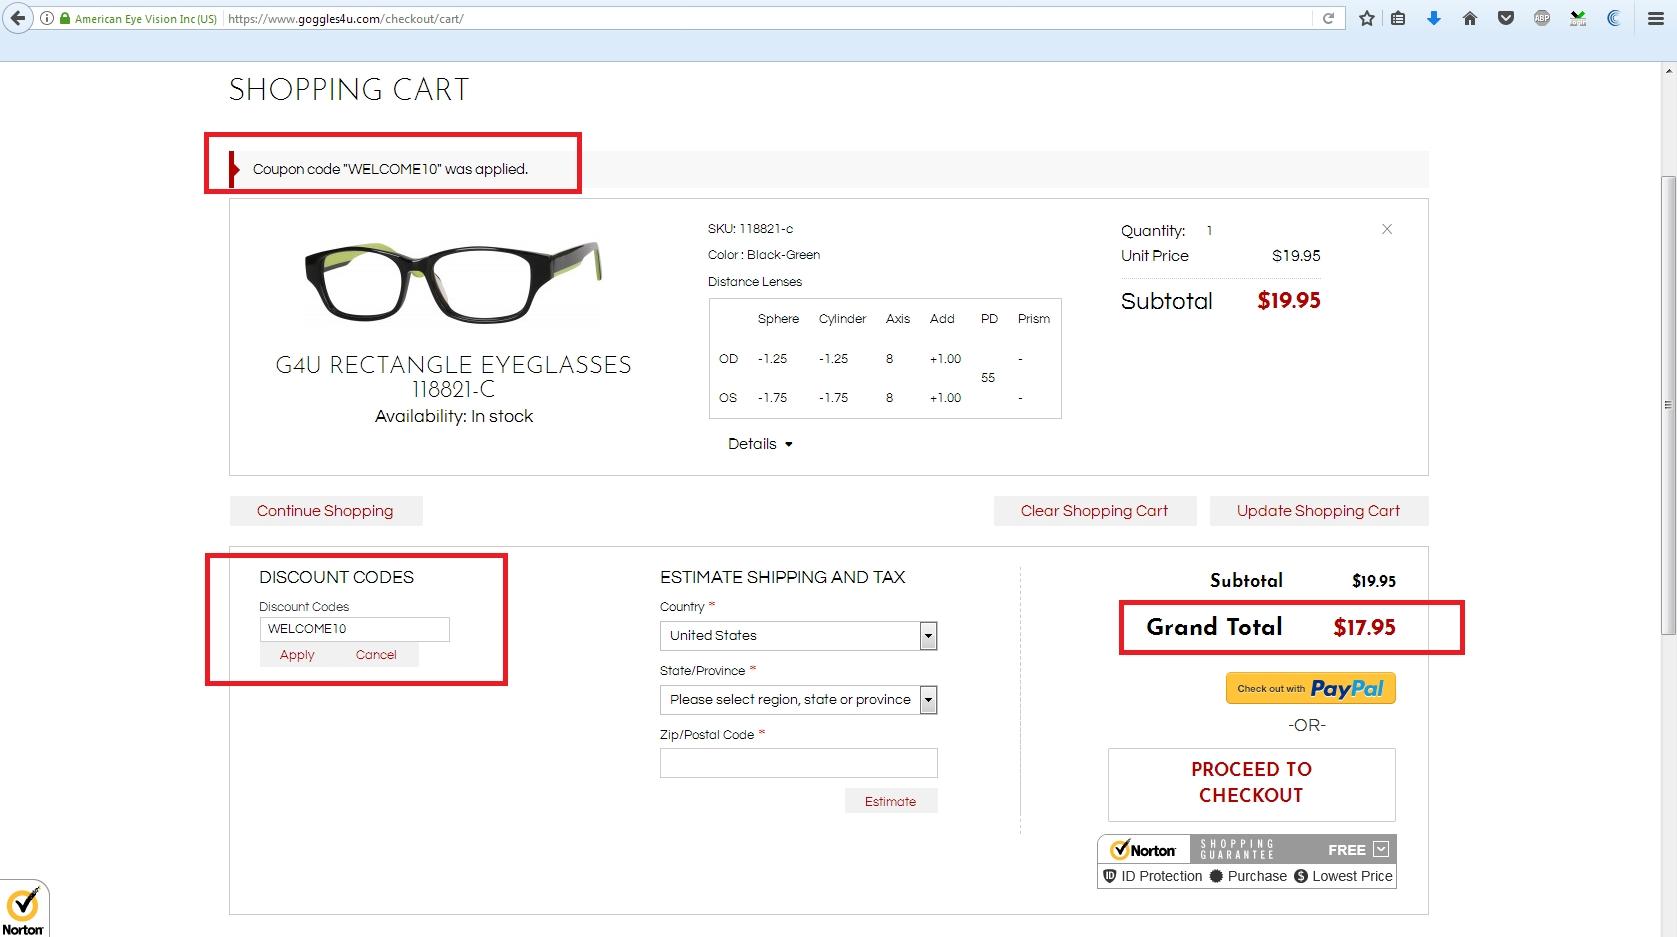 Goggles4u coupon code